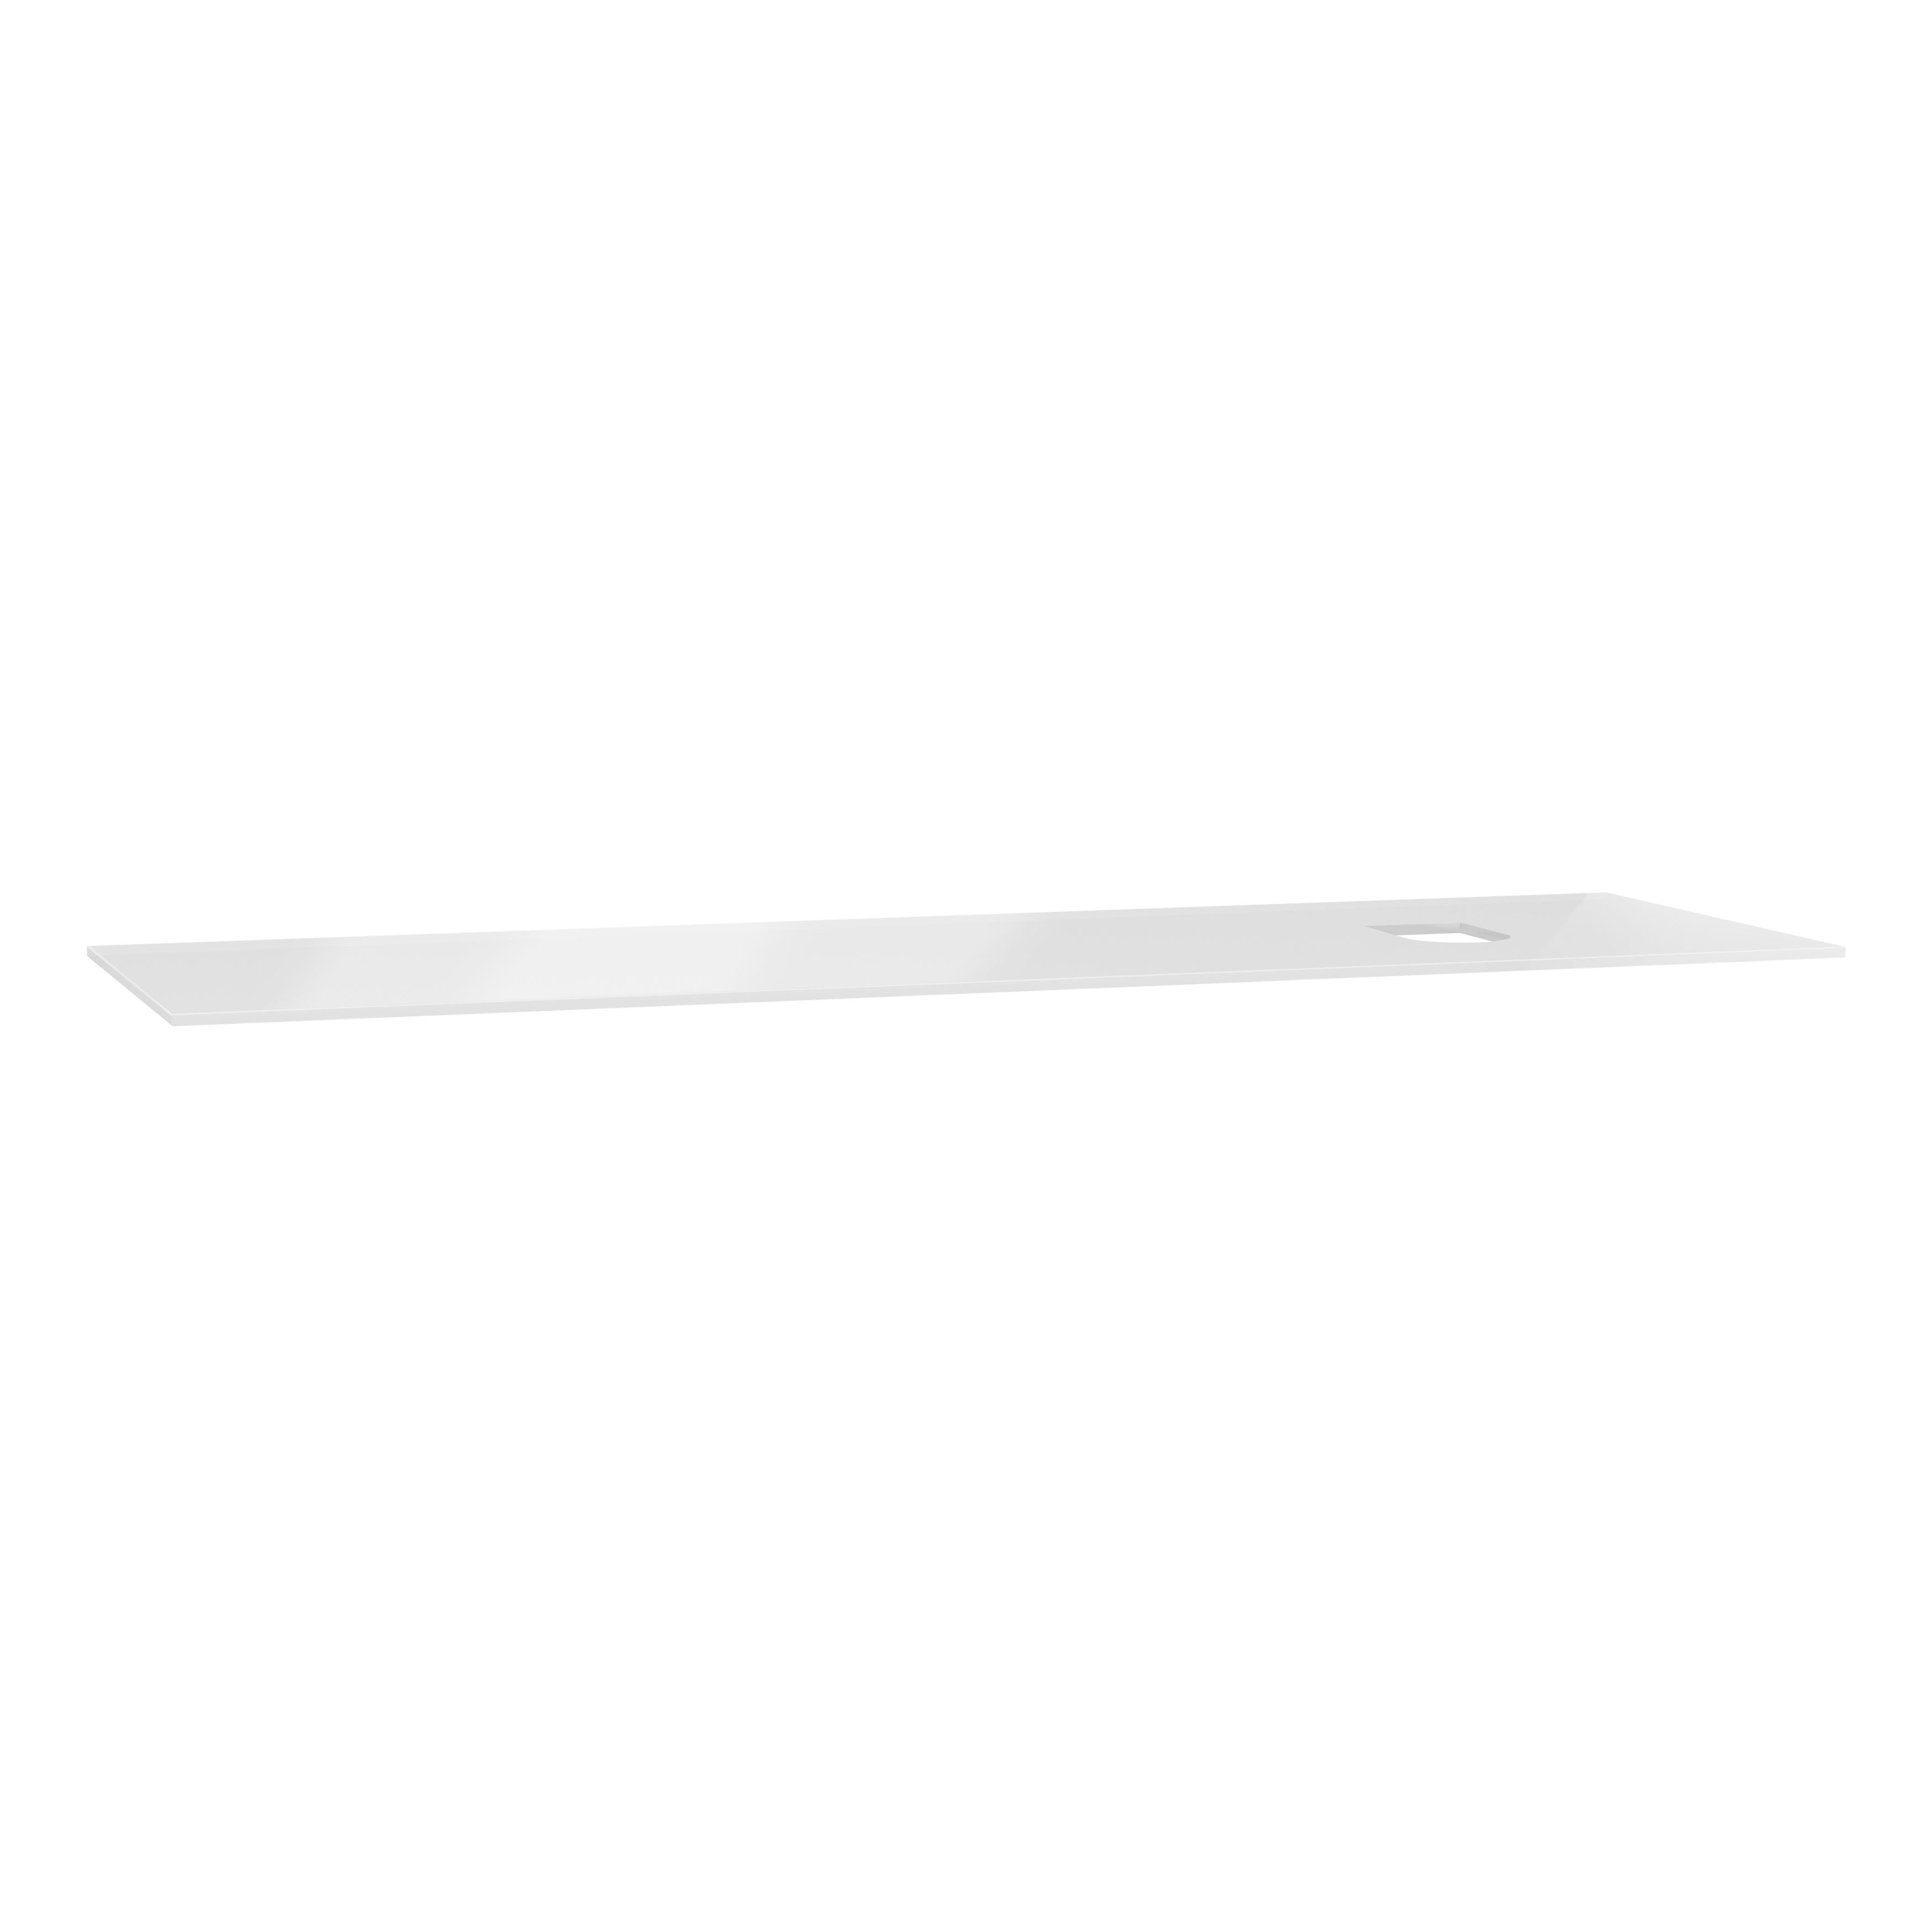 Origin plan de toilette, 150 cm, verre blanc, droite